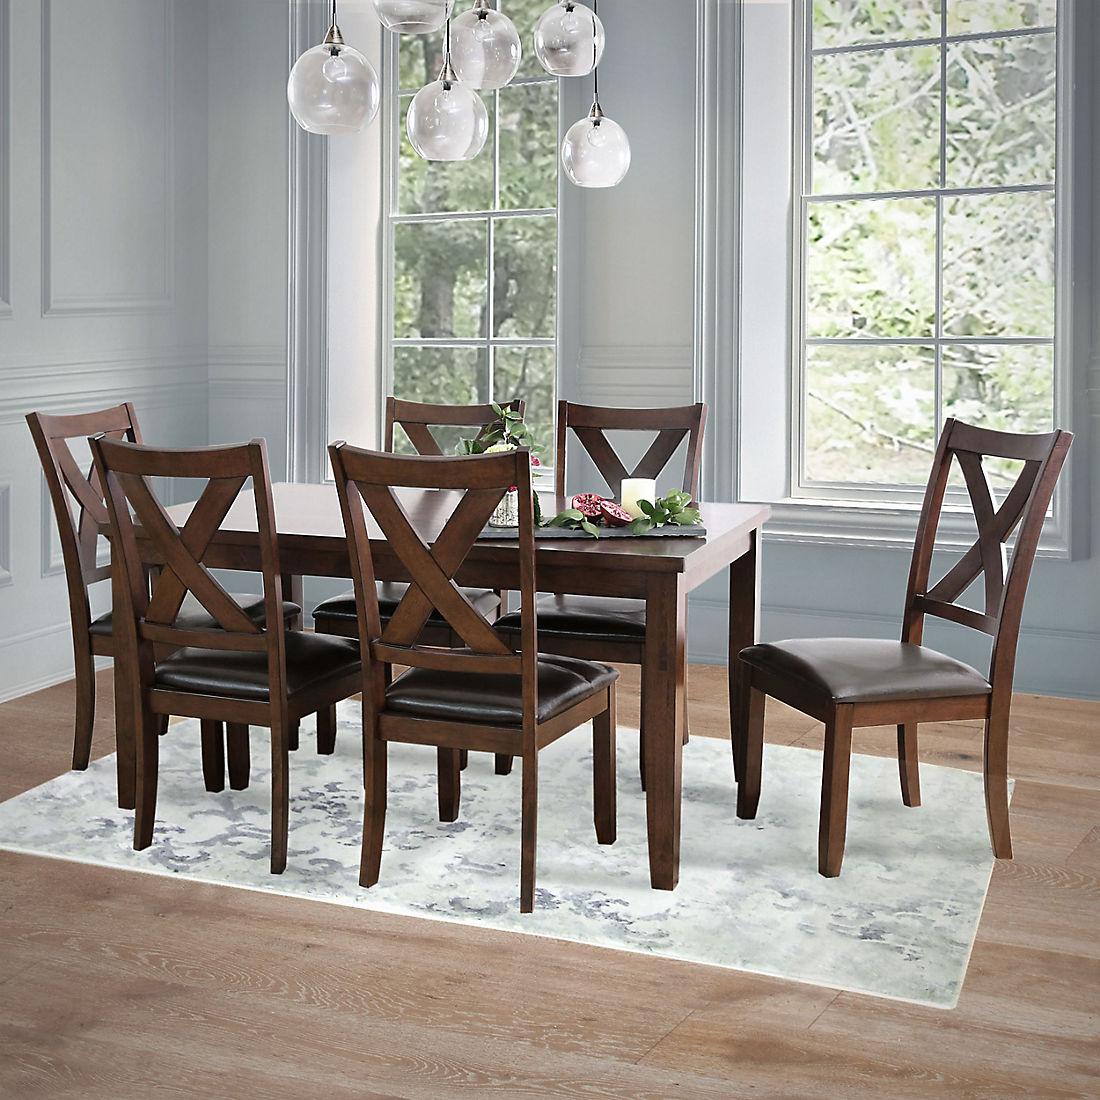 Stupendous Abbyson Living Killian 7 Pc Dining Set Brown Ibusinesslaw Wood Chair Design Ideas Ibusinesslaworg